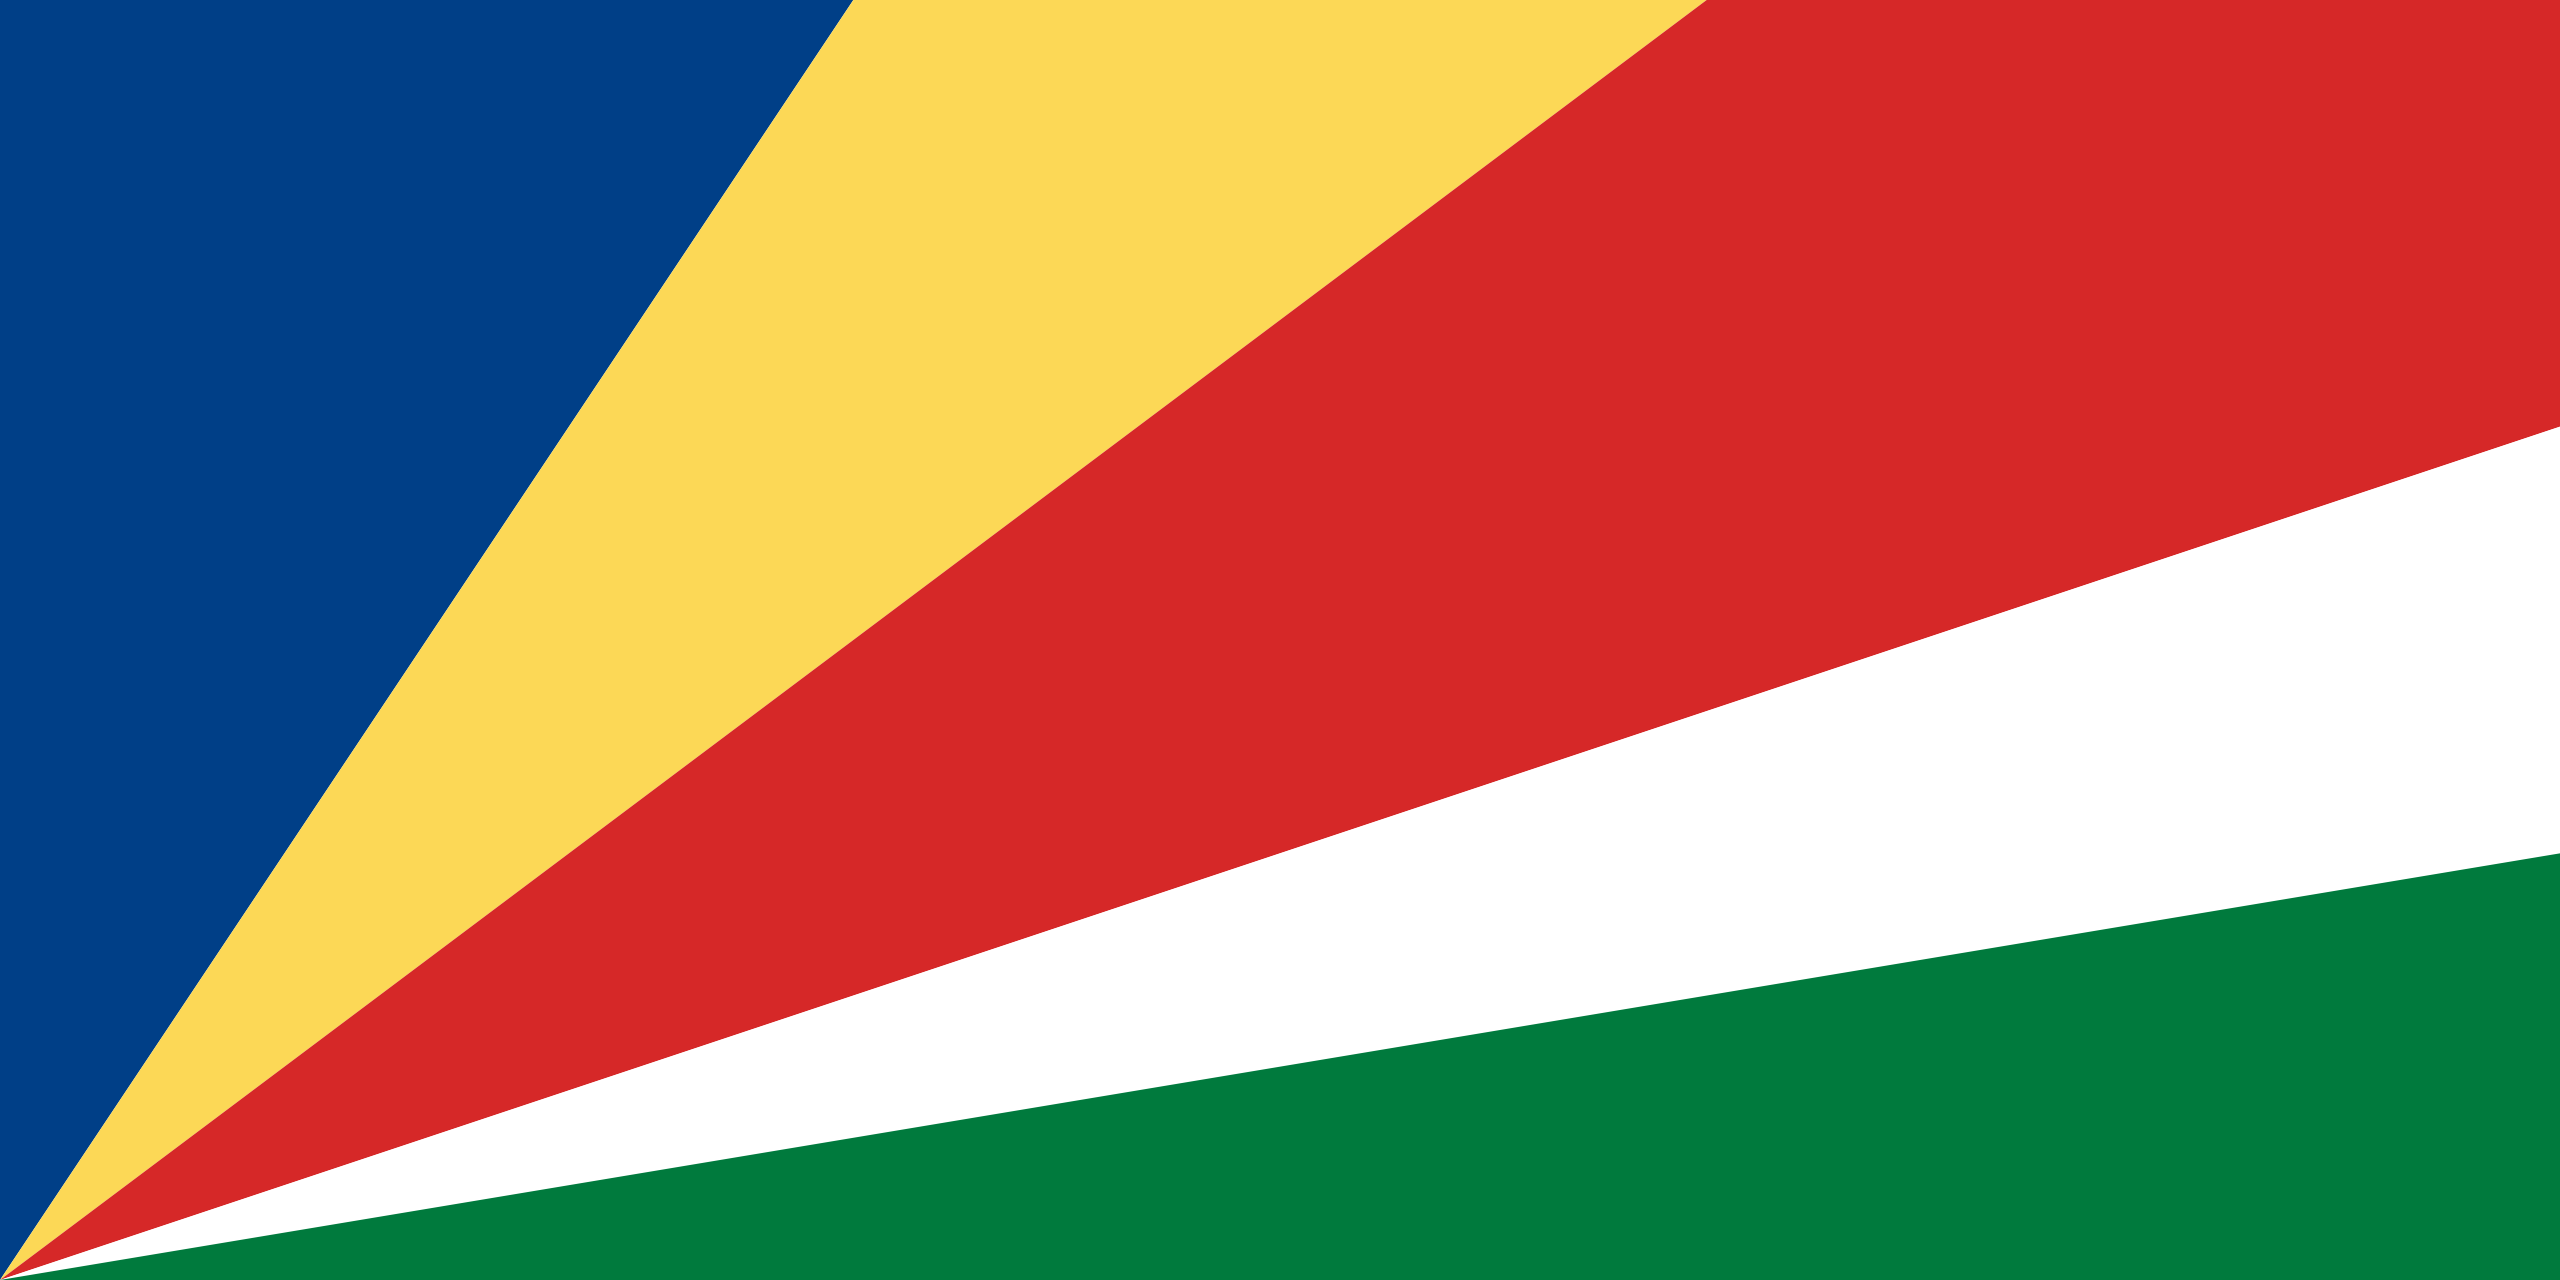 seychelles, país, Brasão de armas, logotipo, símbolo - Papéis de parede HD - Professor-falken.com